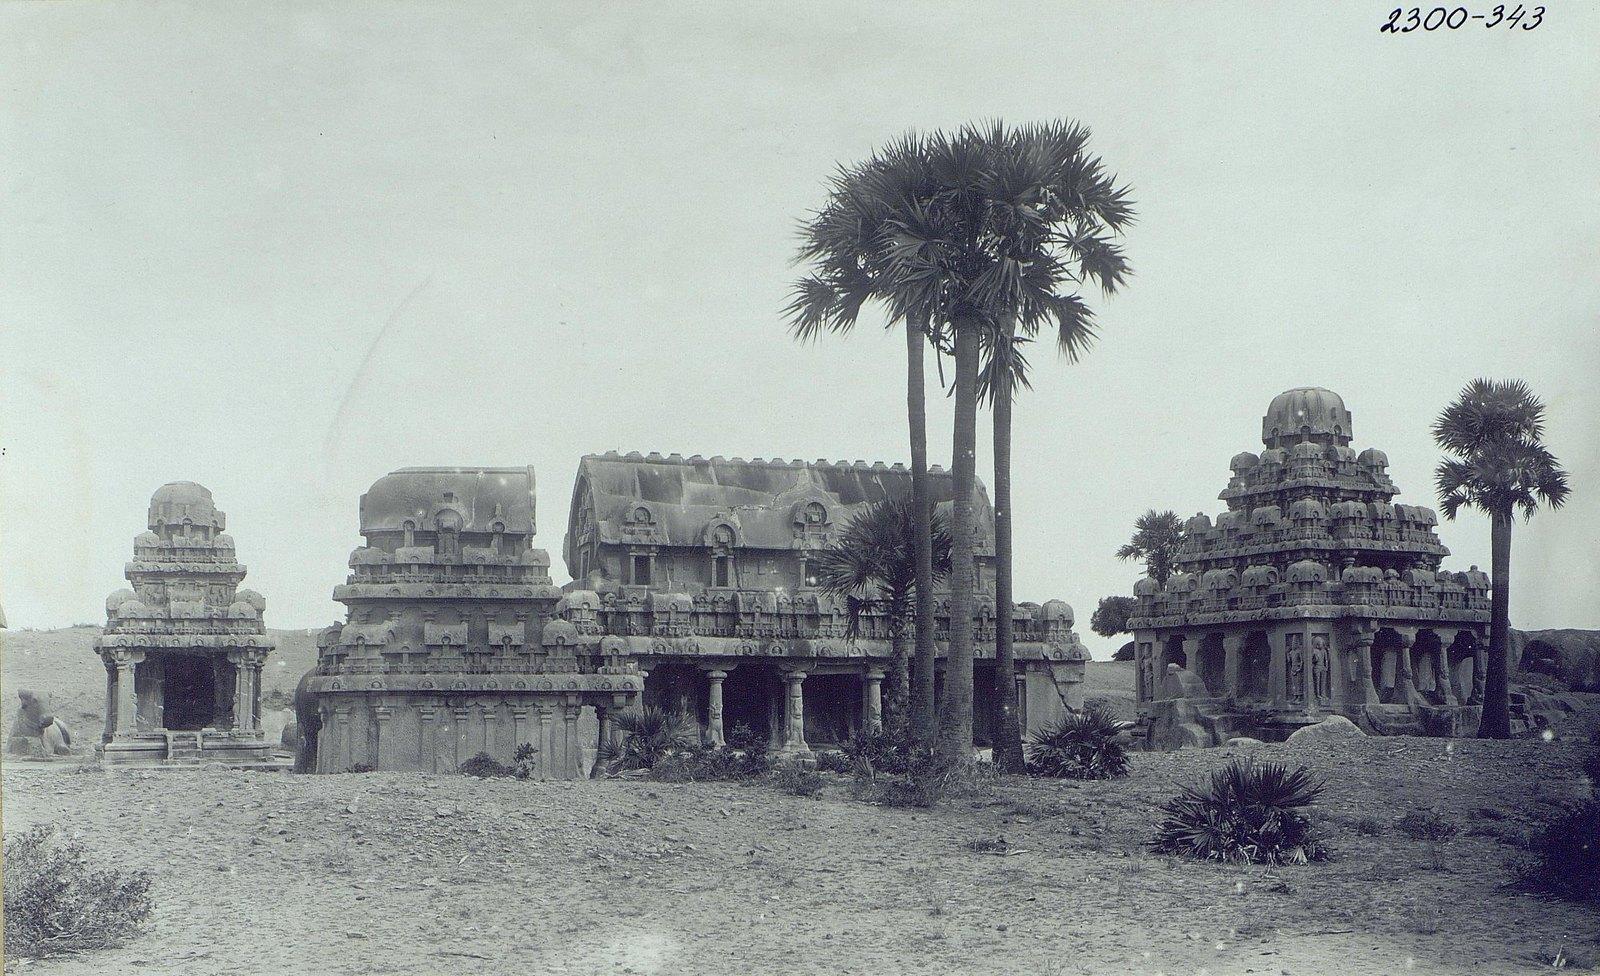 Мамаллапур (общий вид храма) (6)